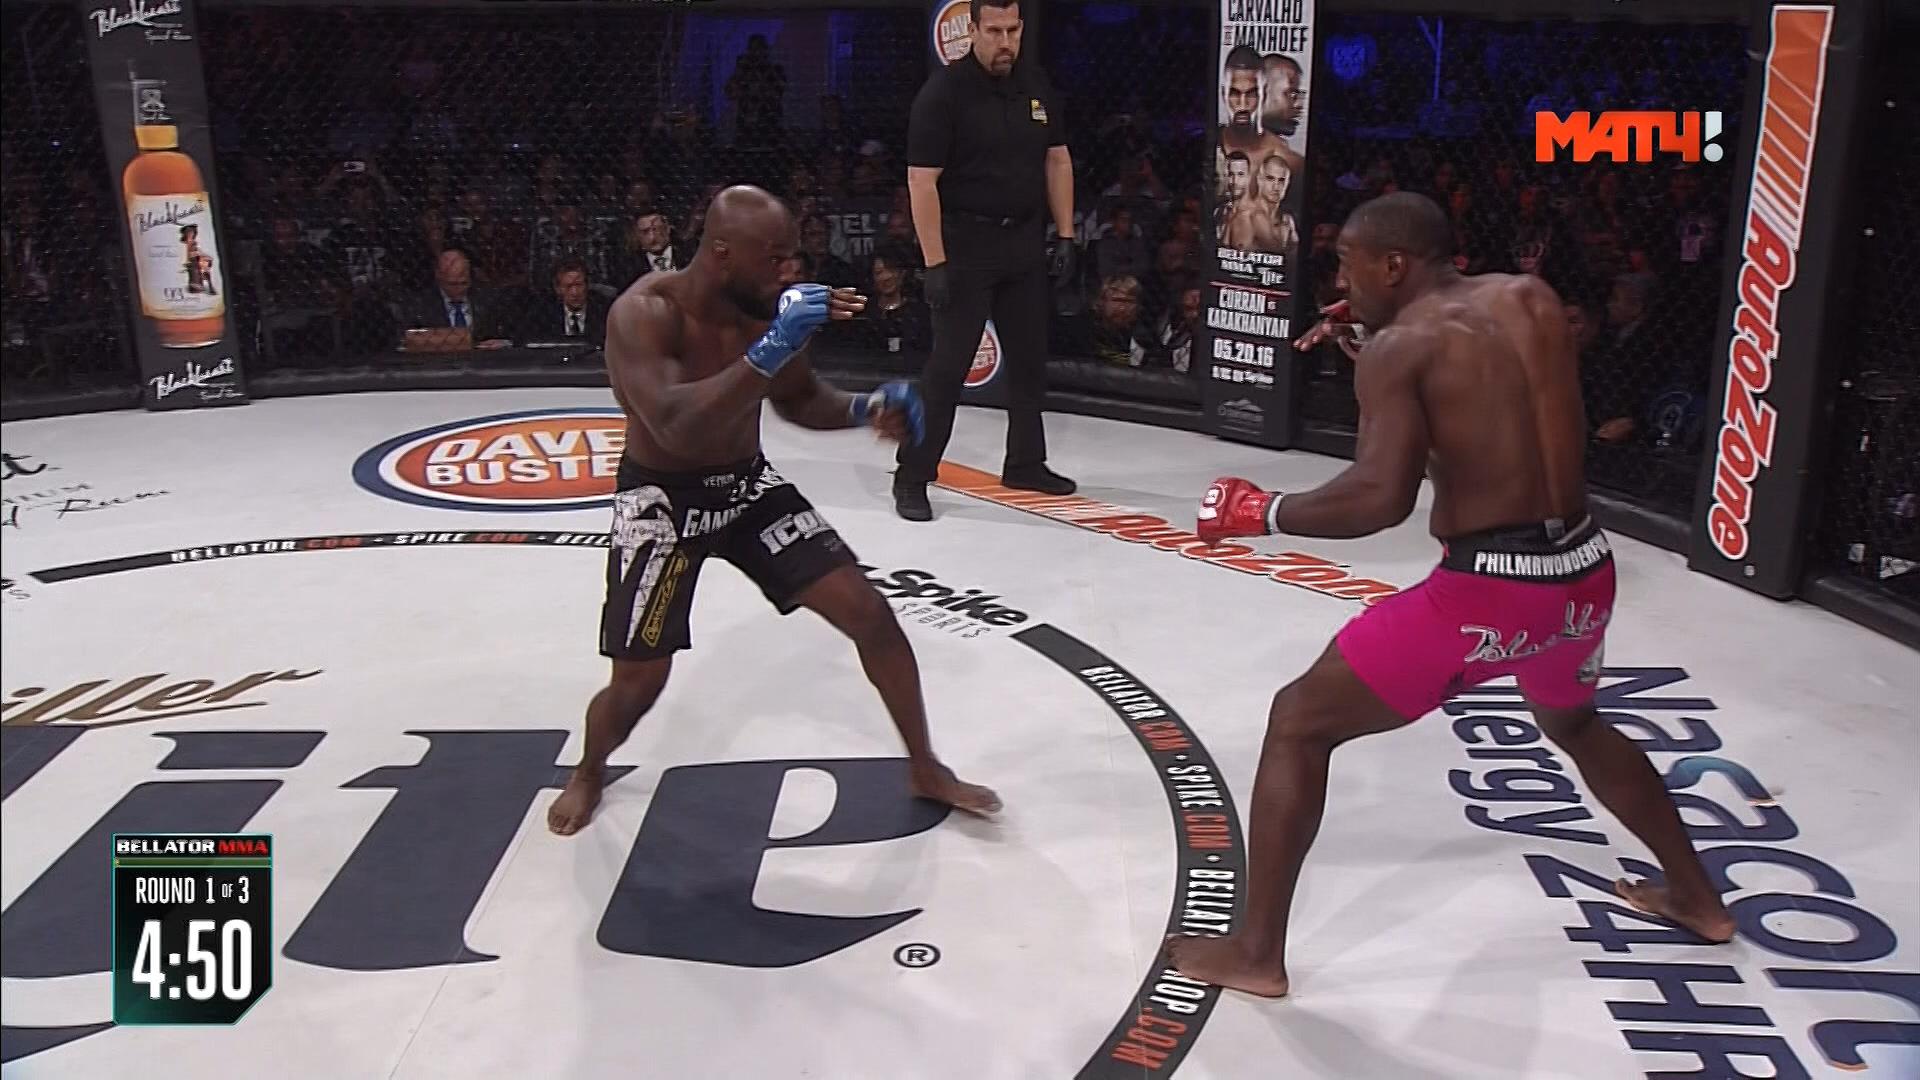 Смешанные единоборства - MMA. Bellator 154: Davis vs. King Mo + Main card (2016) HDTV 1080i | МатчТВ